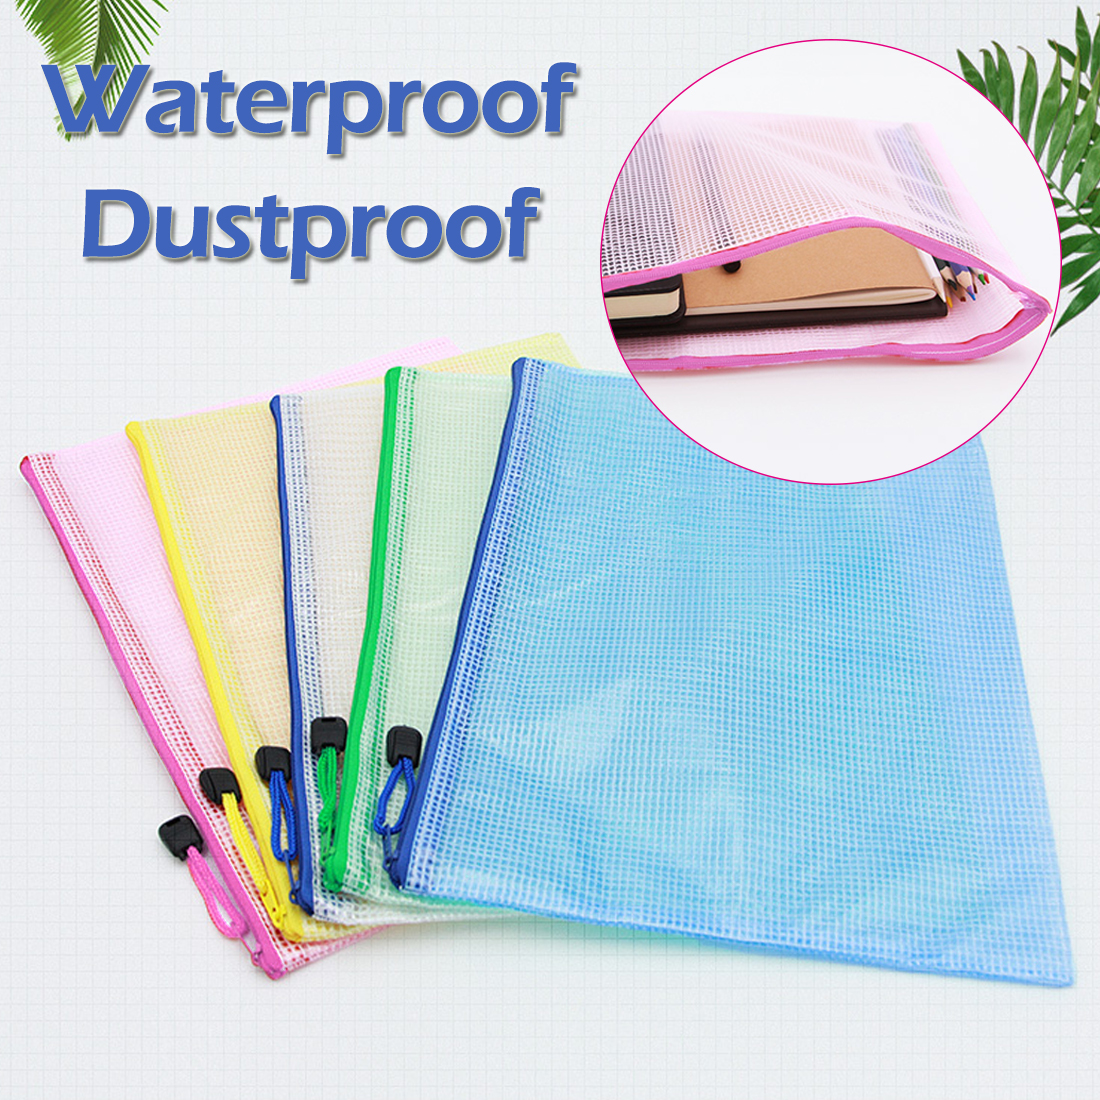 A4 Size Waterproof Plastic Zipper Paper File Folder Book Pencil Pen Case Bag File Document Bag For Office Student Supplies